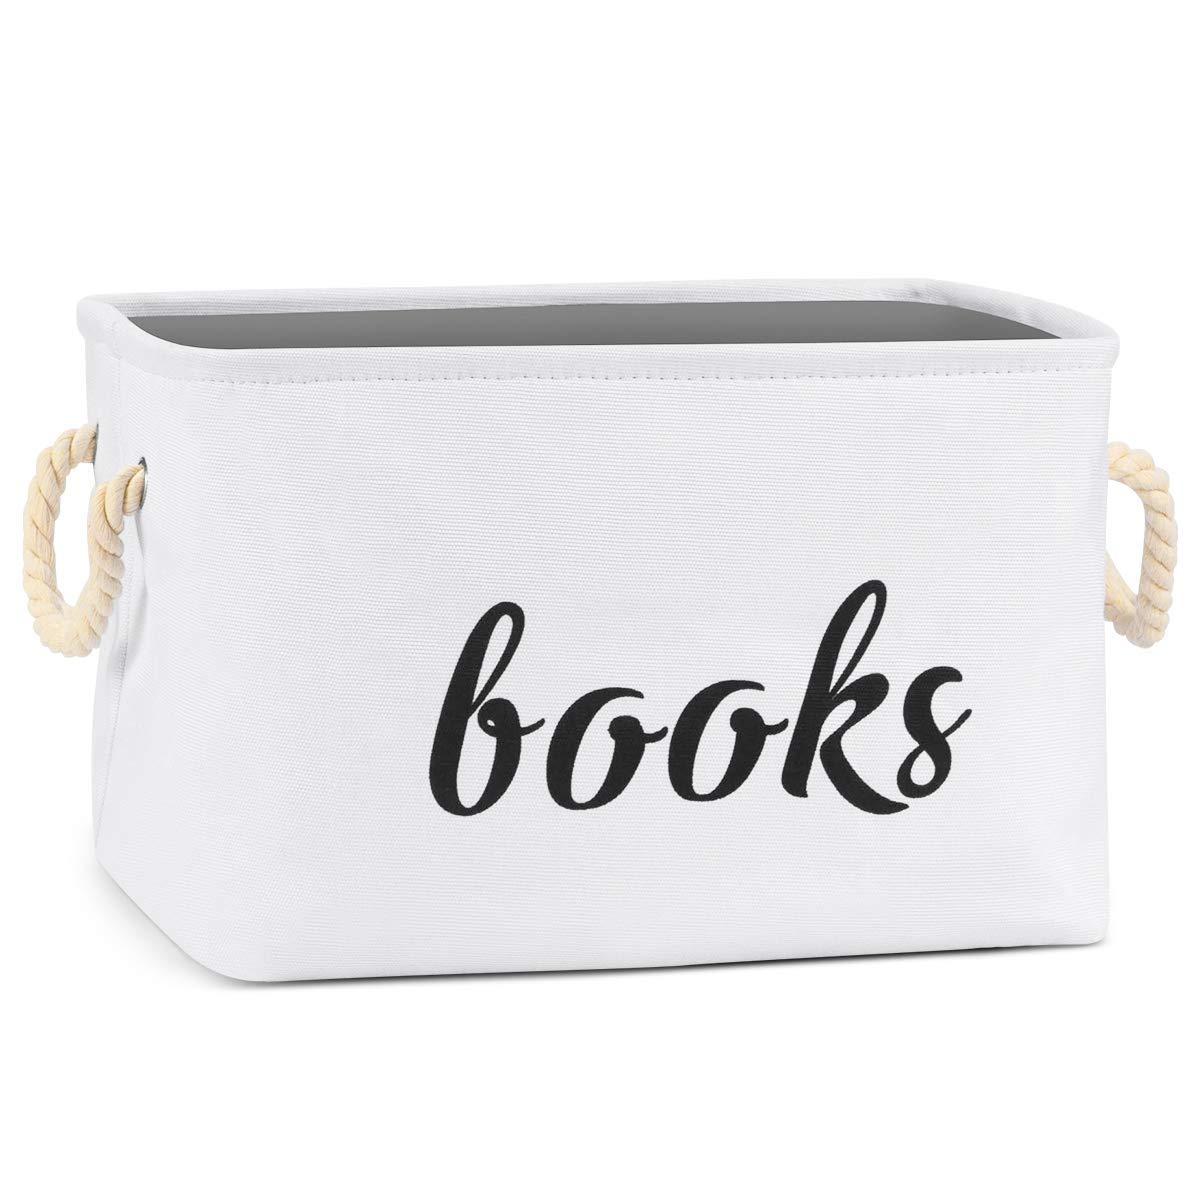 New popularity GIRVEM Branded goods Books Storage Basket Organizer Box Kids Baby or for Pet